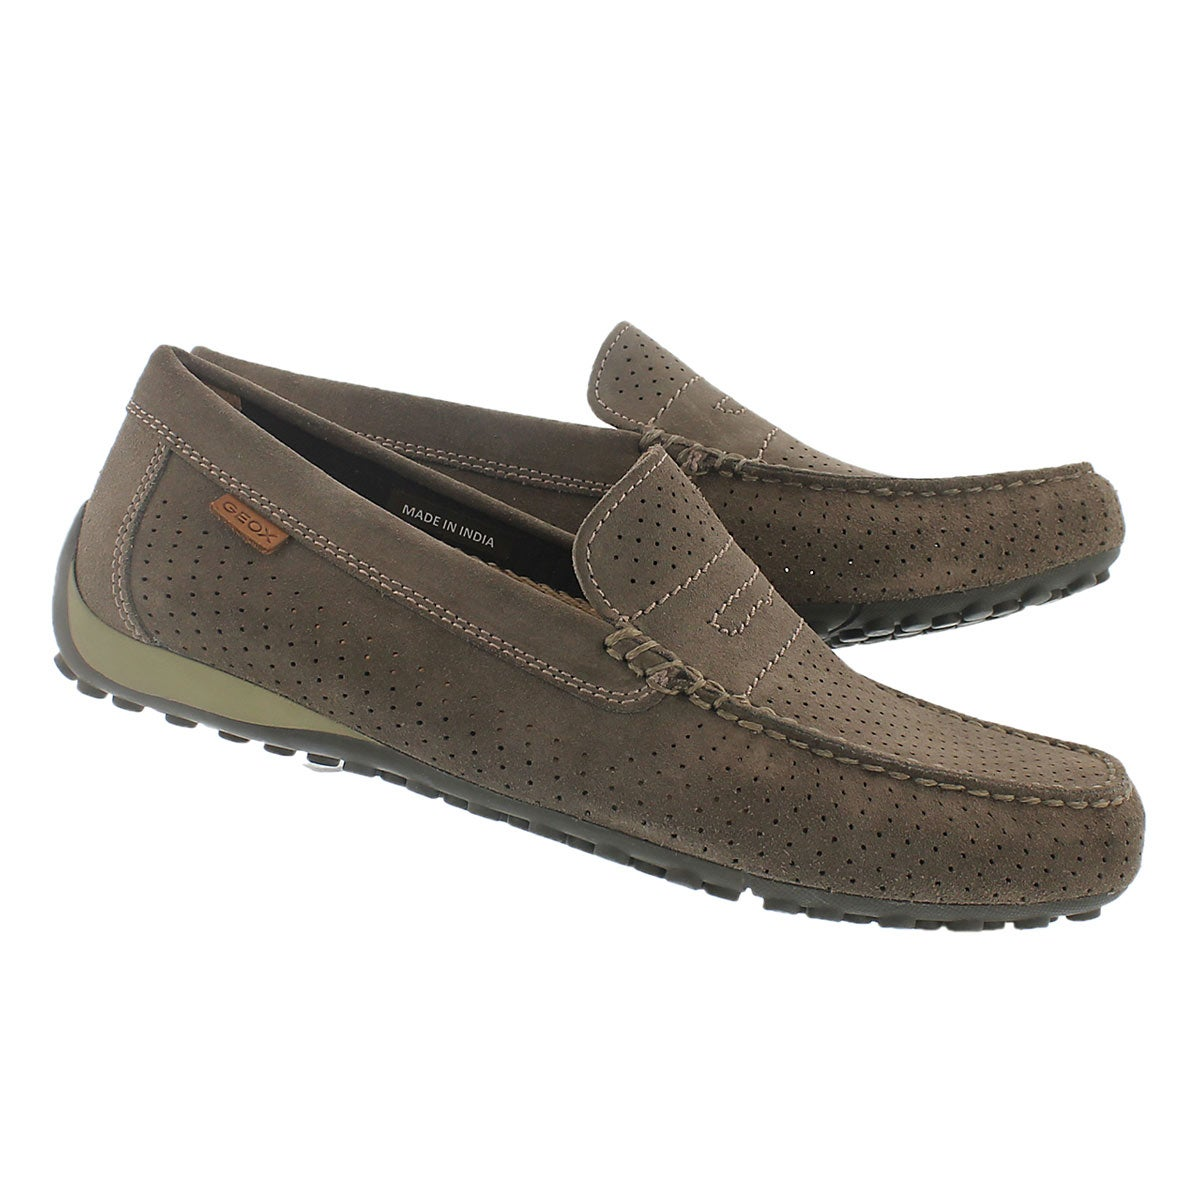 Mns Snake Moc 2Fit dove grey loafer